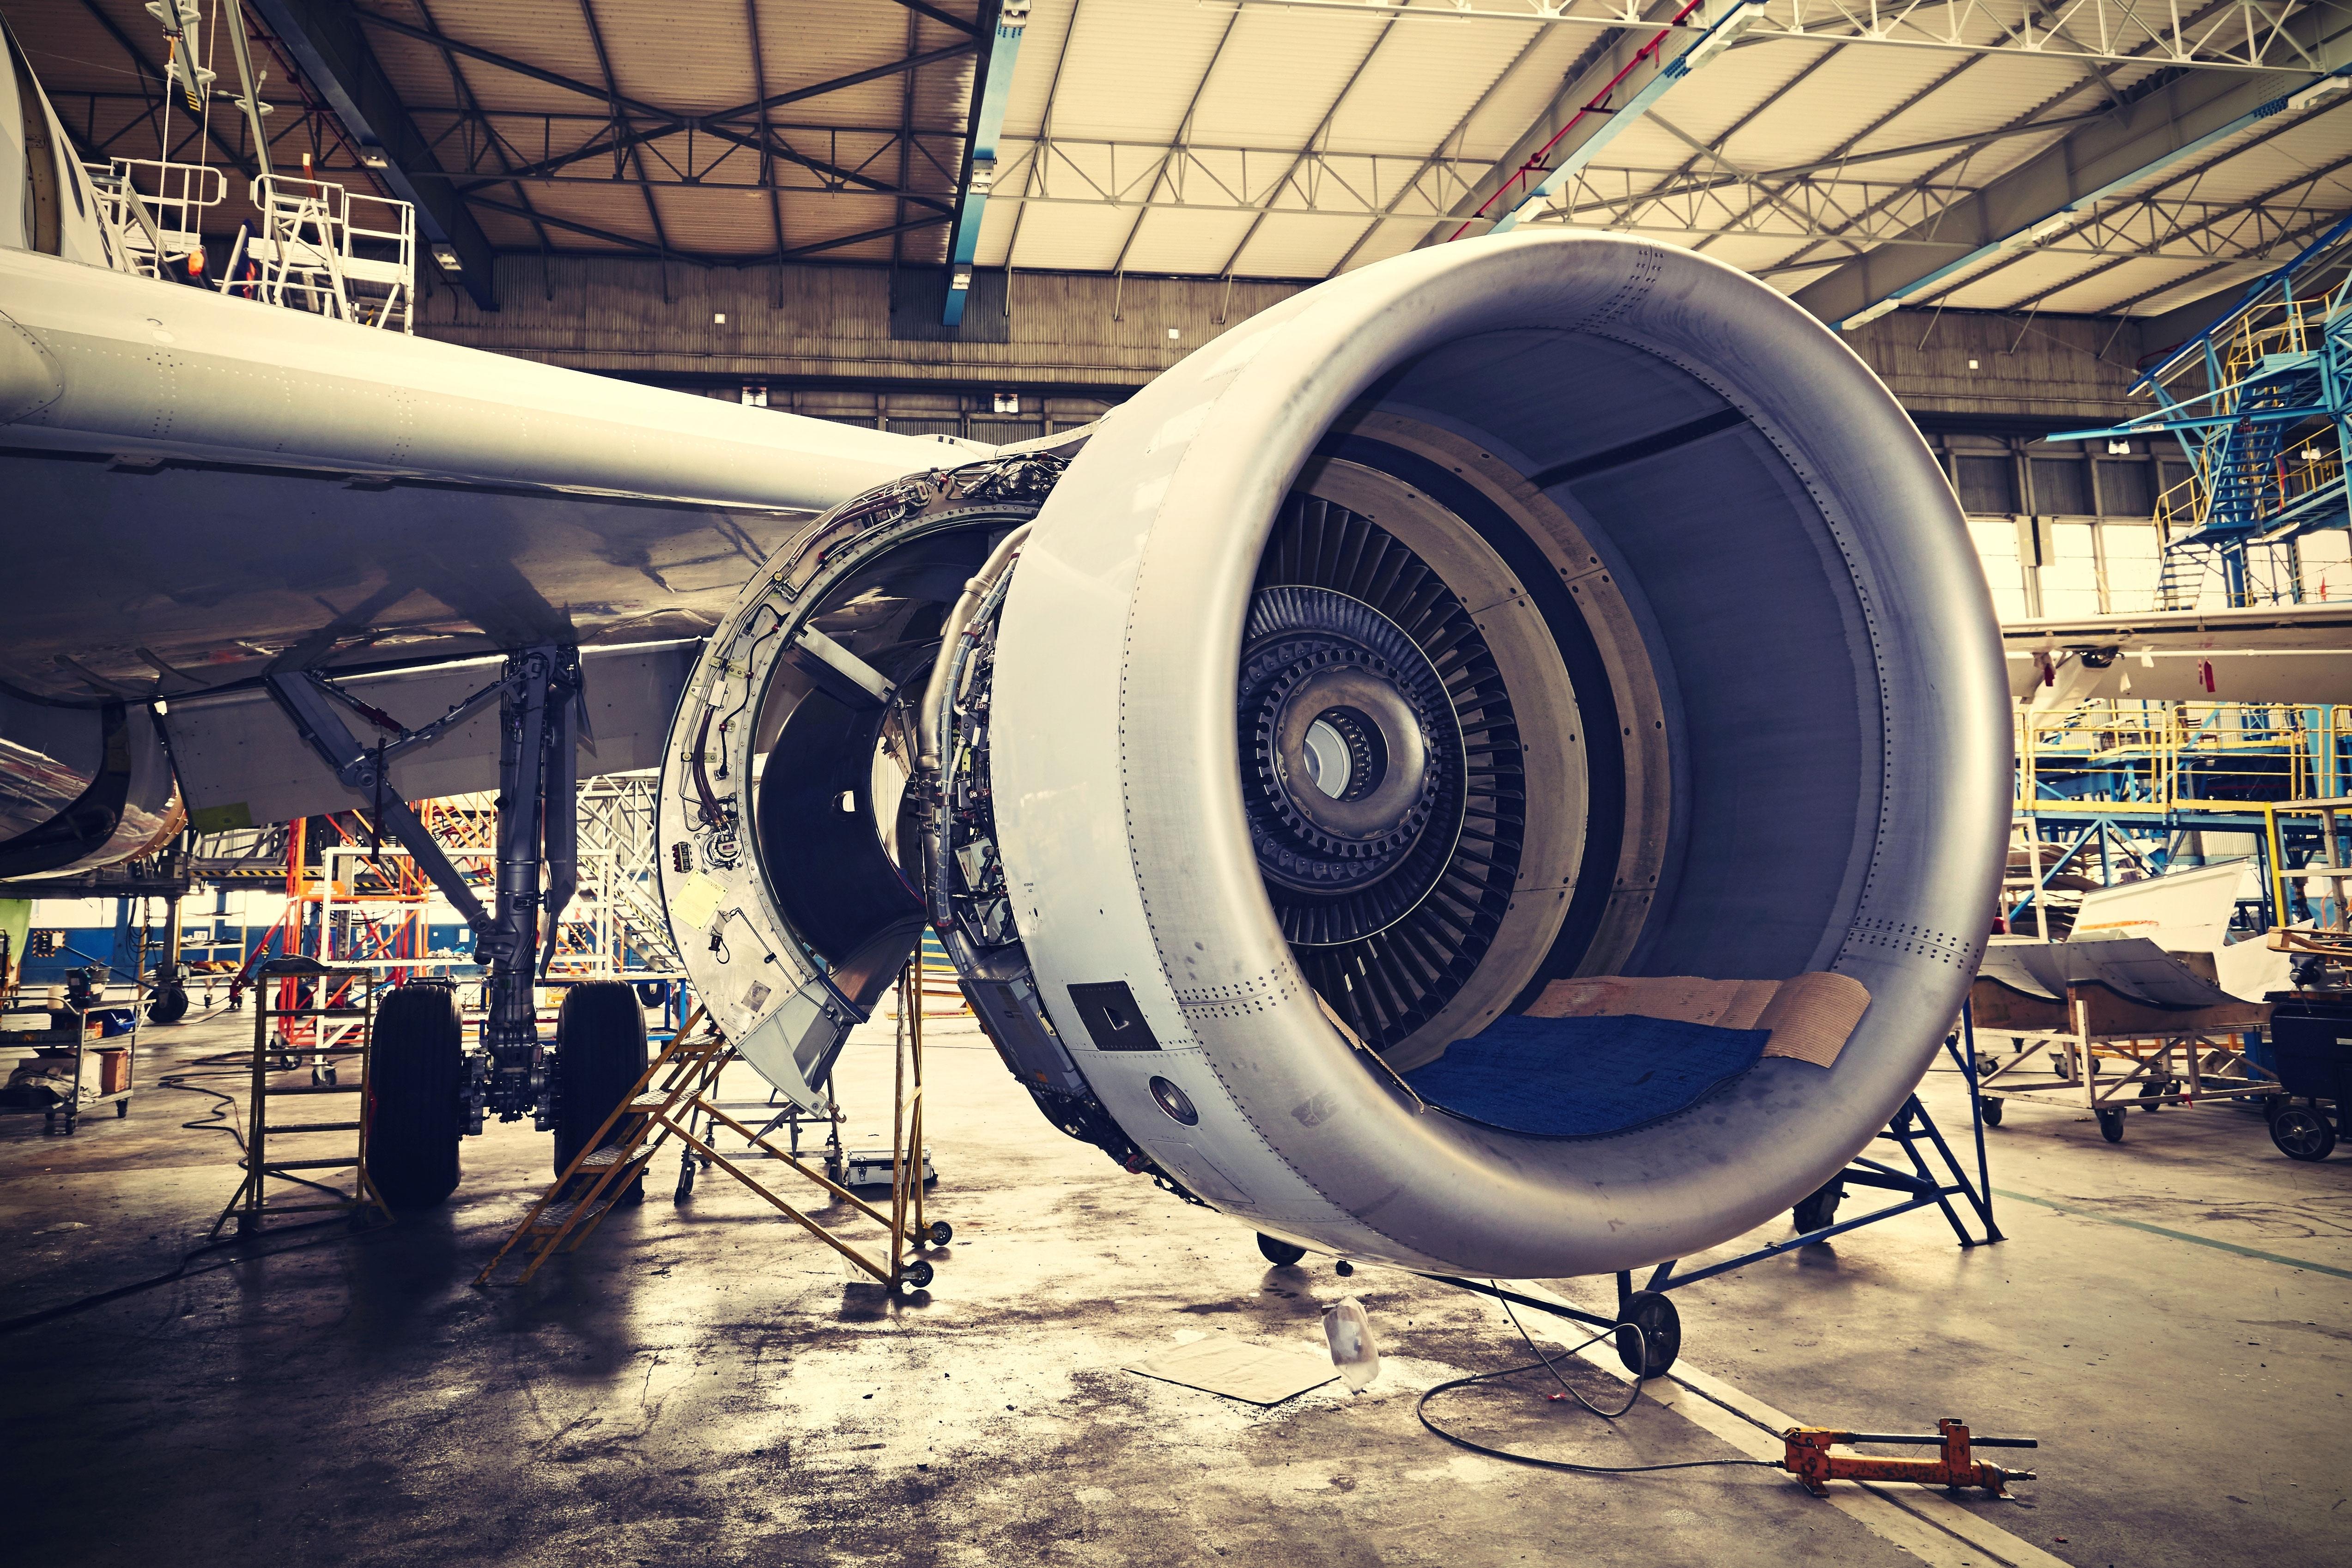 Aerospace & Defense parts   Airplane engine undergoing heavy maintenance